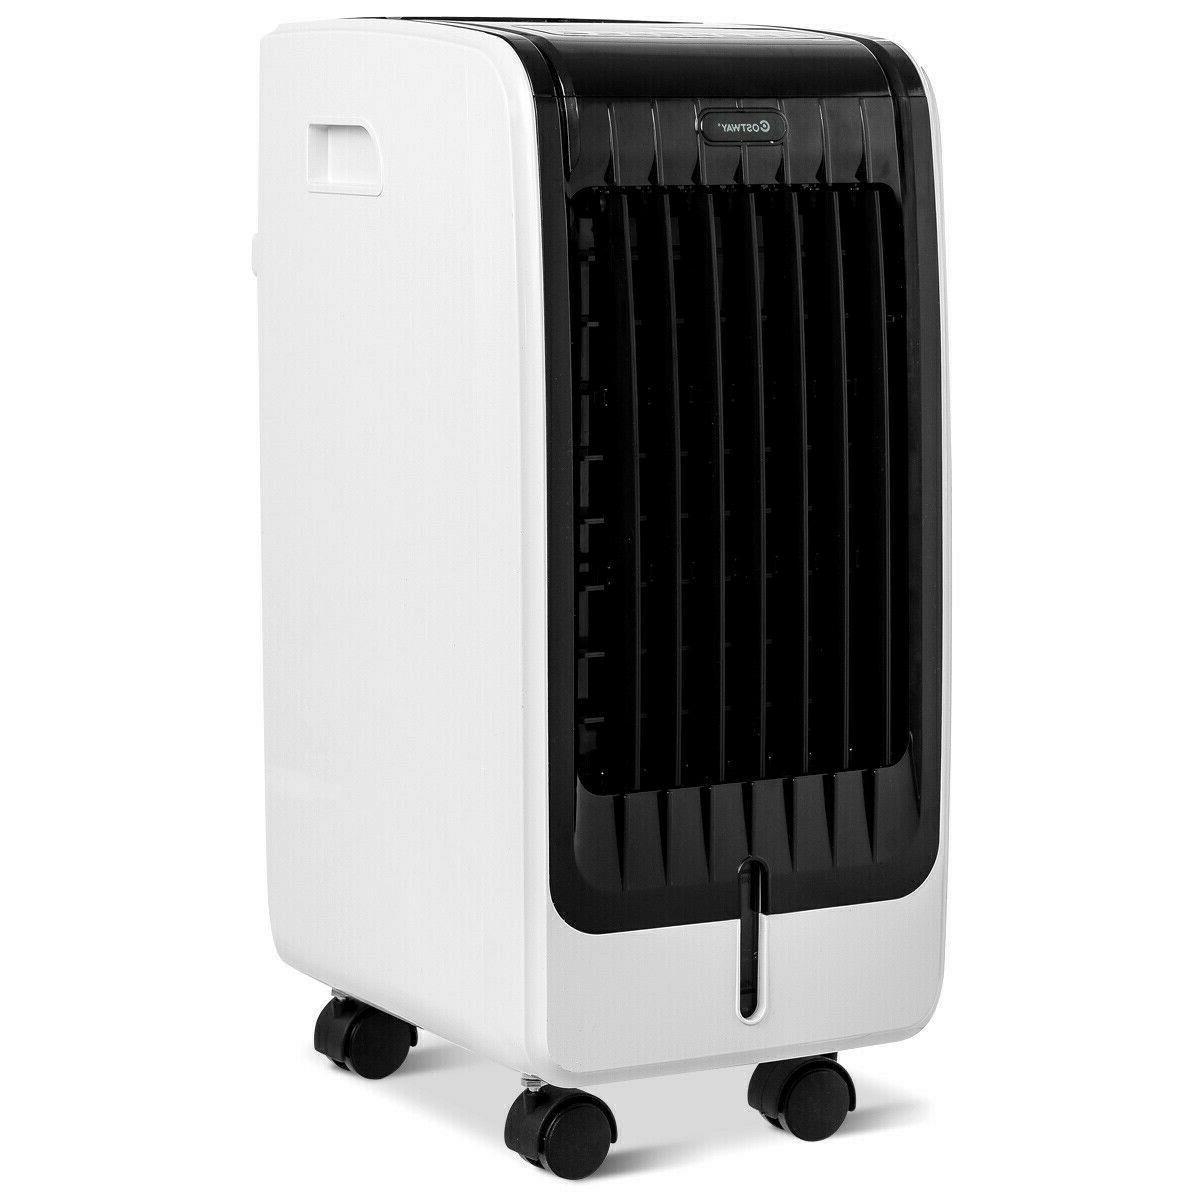 Portable Conditioner Cooler Unit Remote Control Room